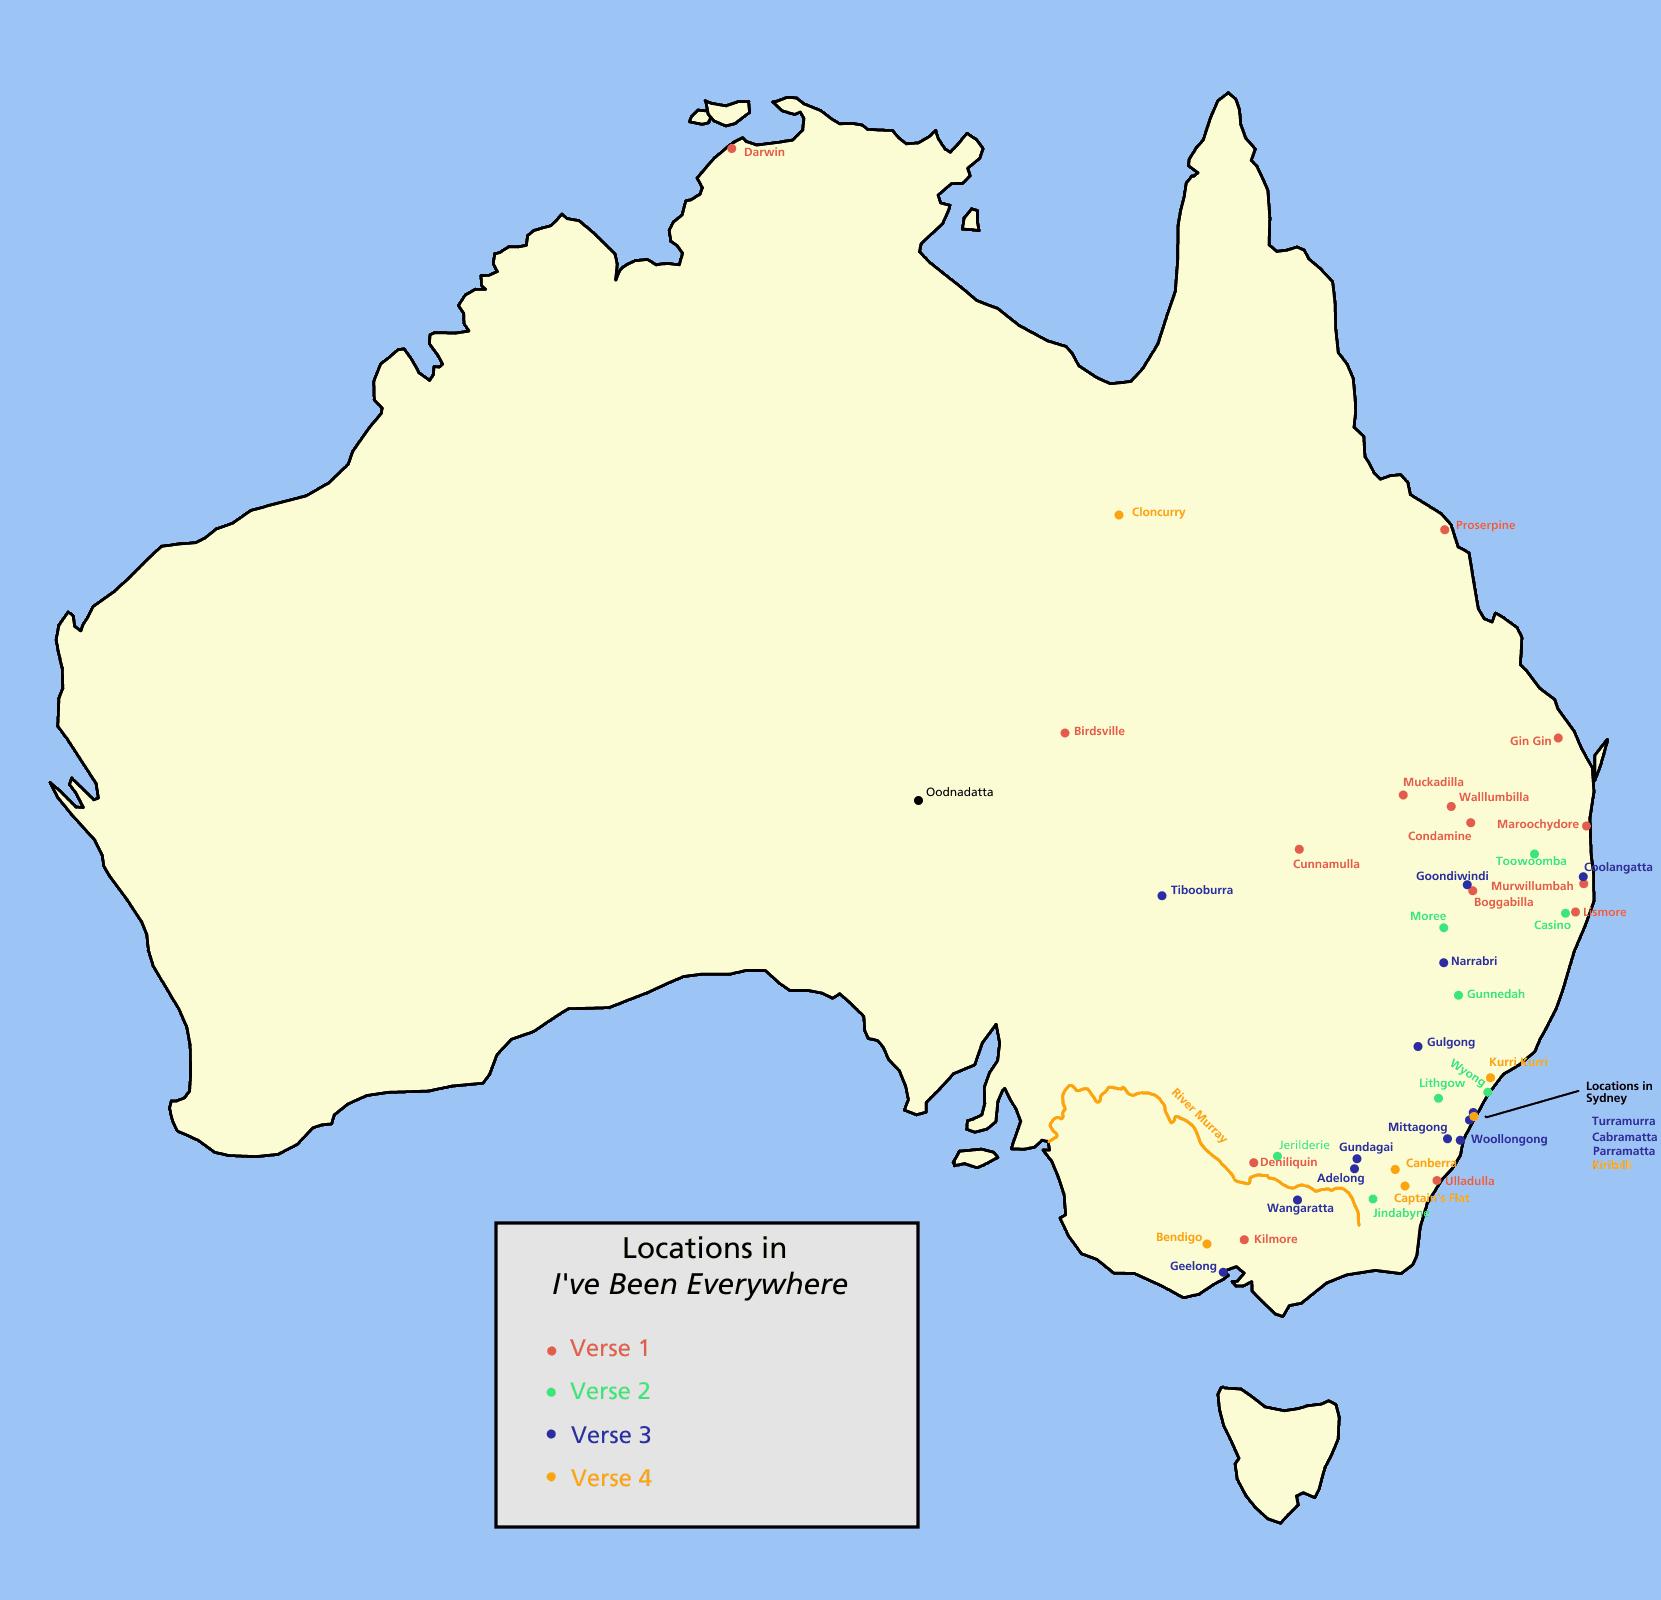 FileAustralia ive been everywherePNG Wikimedia Commons